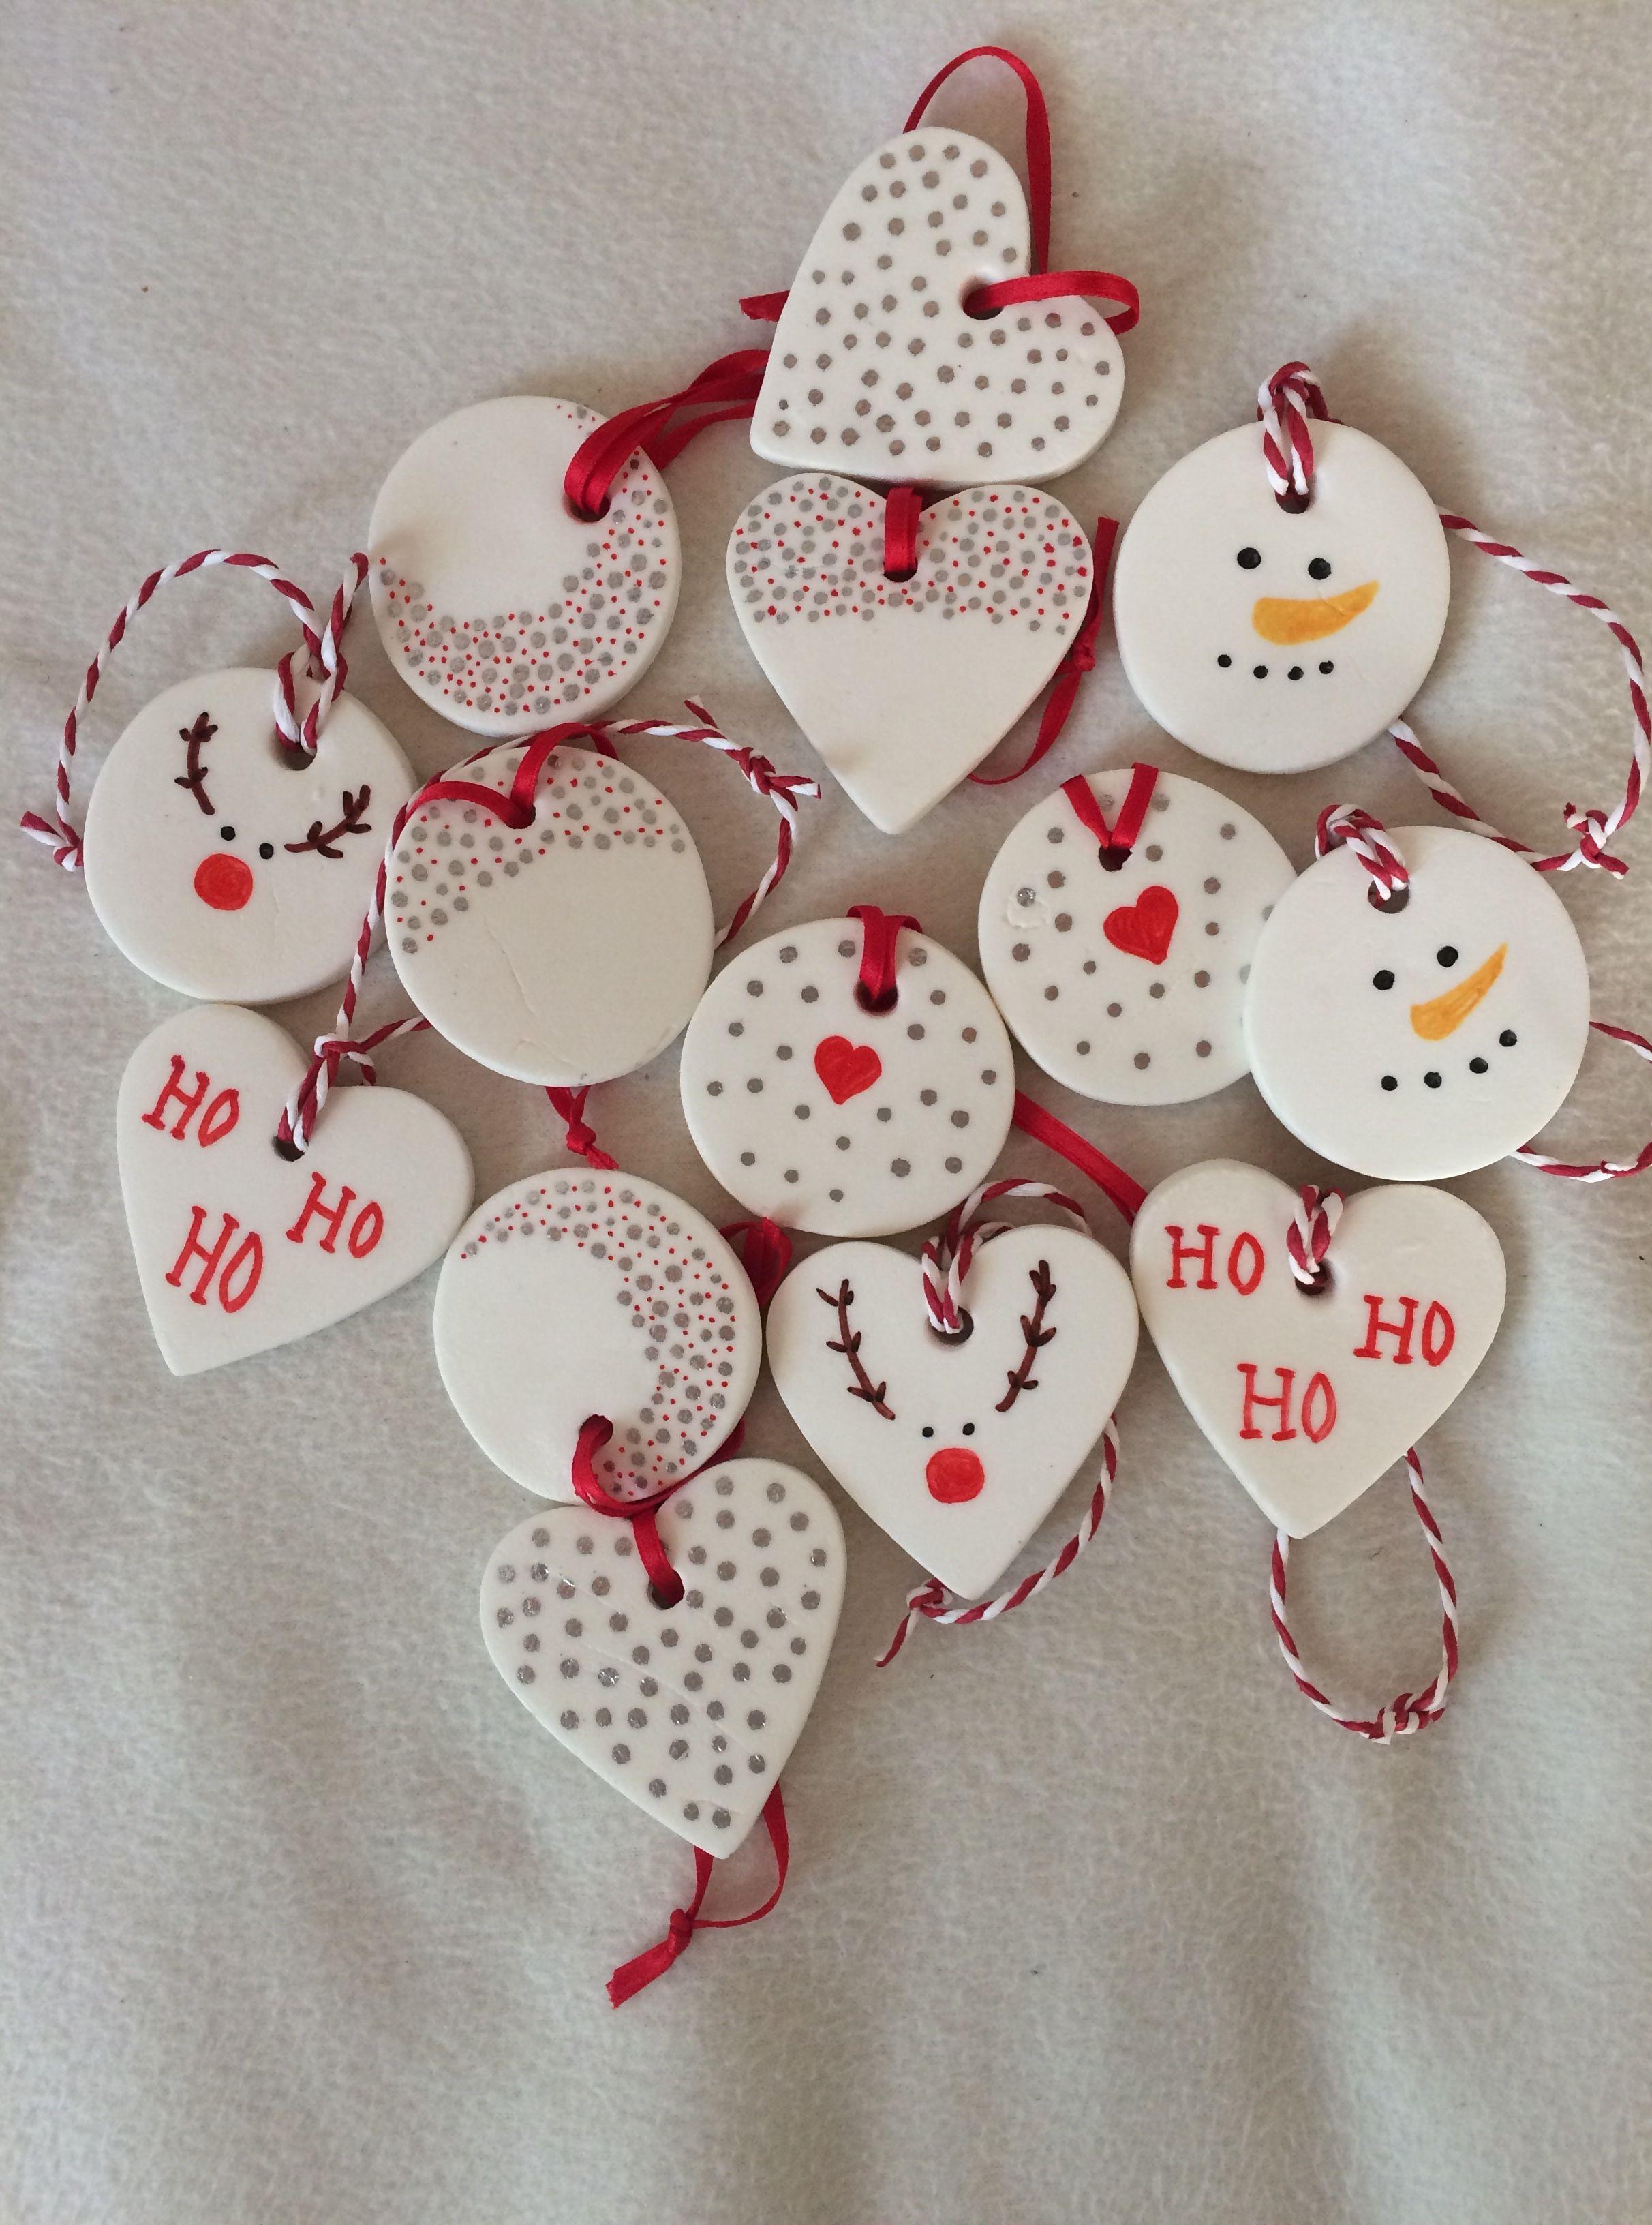 Baking Soda Clay Decorations Christmas Clay Clay Christmas Decorations Baking Soda Clay